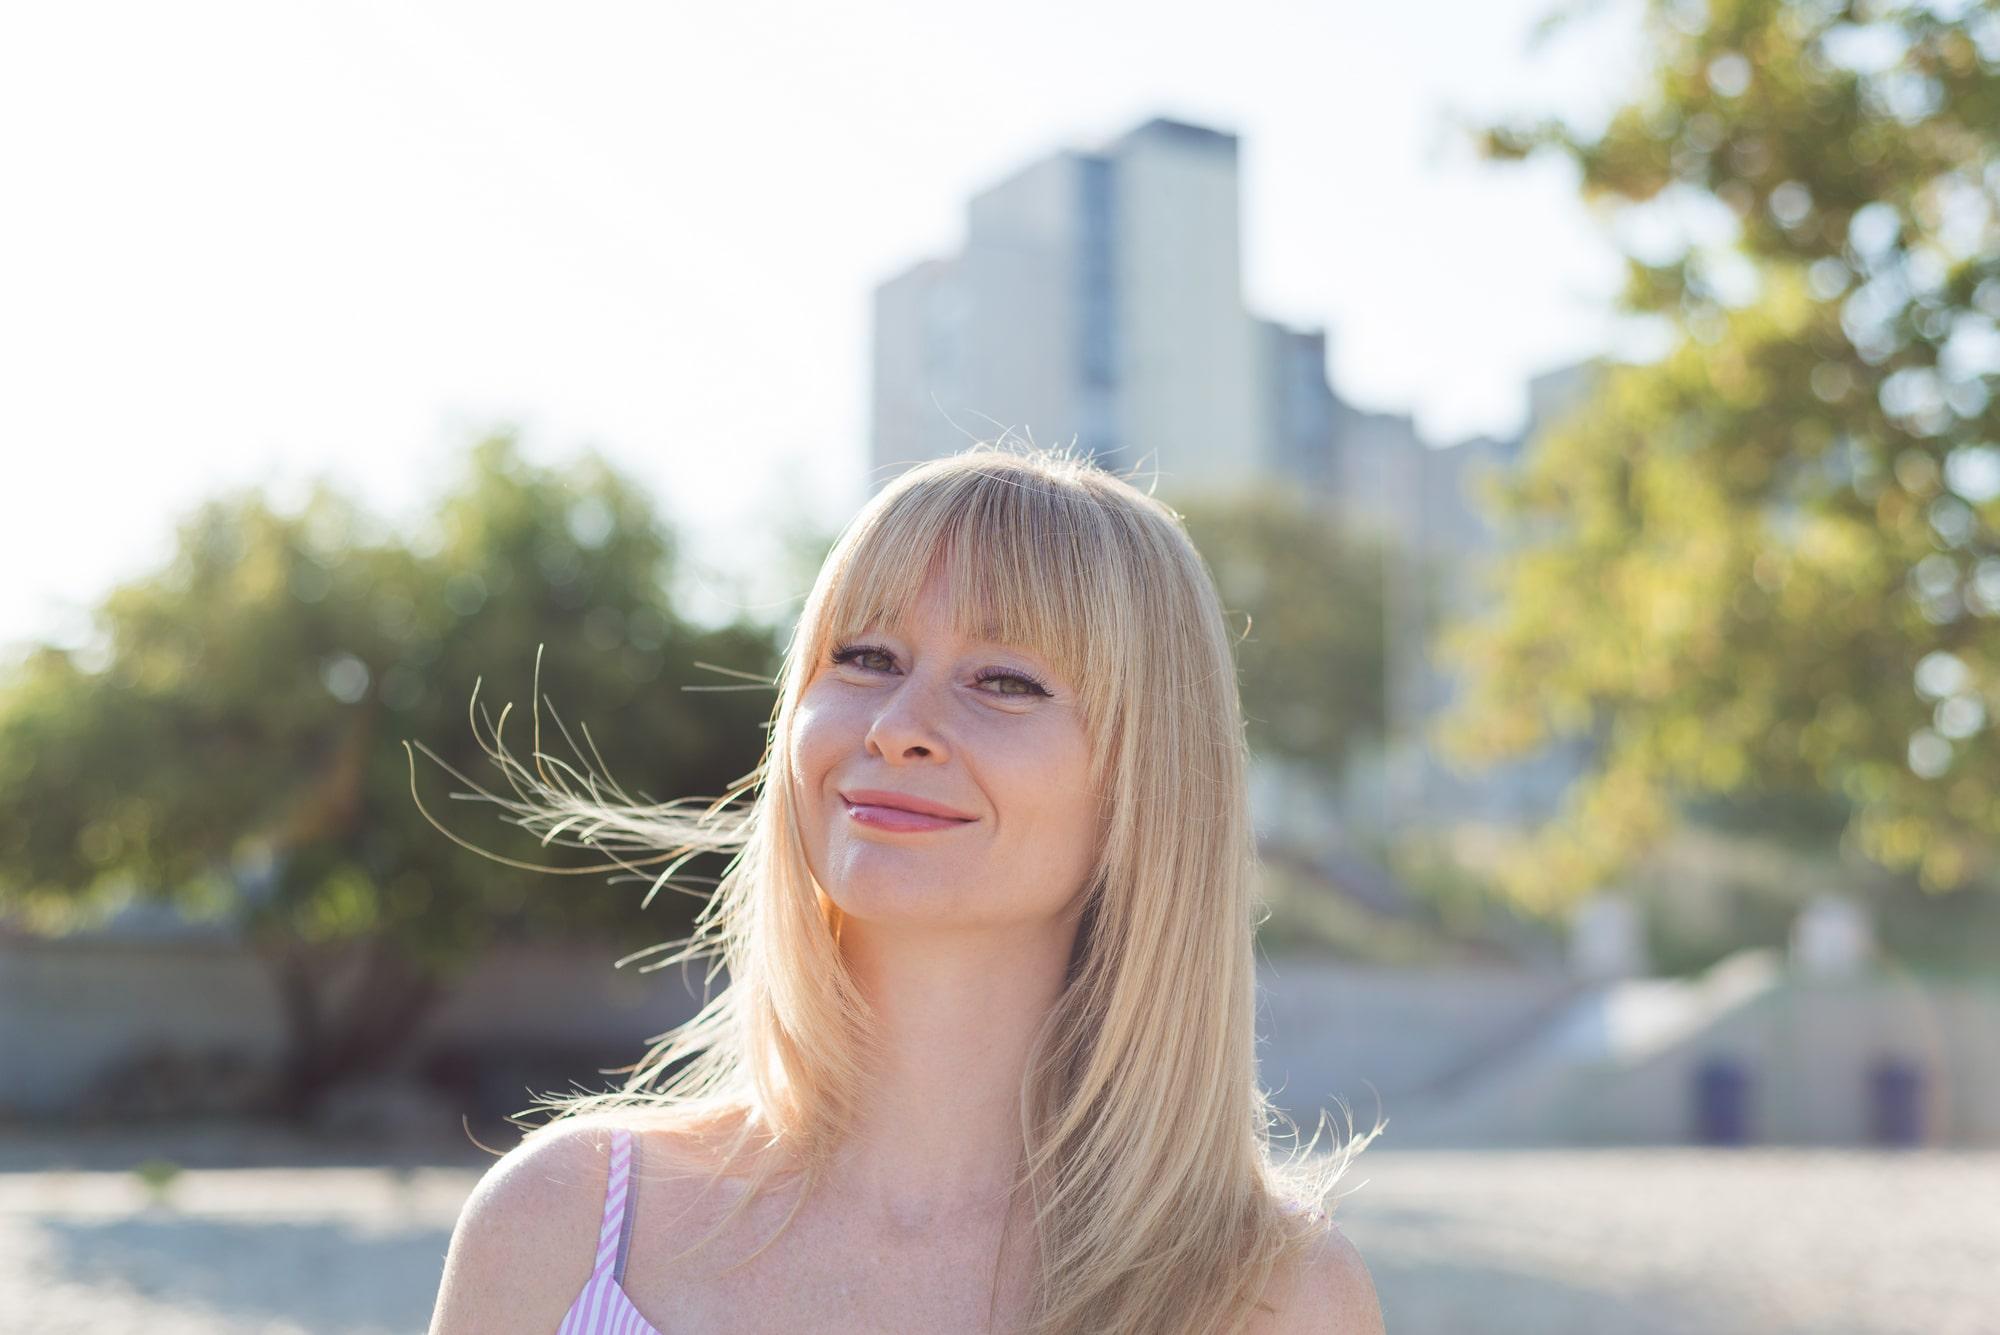 Фотосессия девушки возле реки Днепр - солнечная улыбка